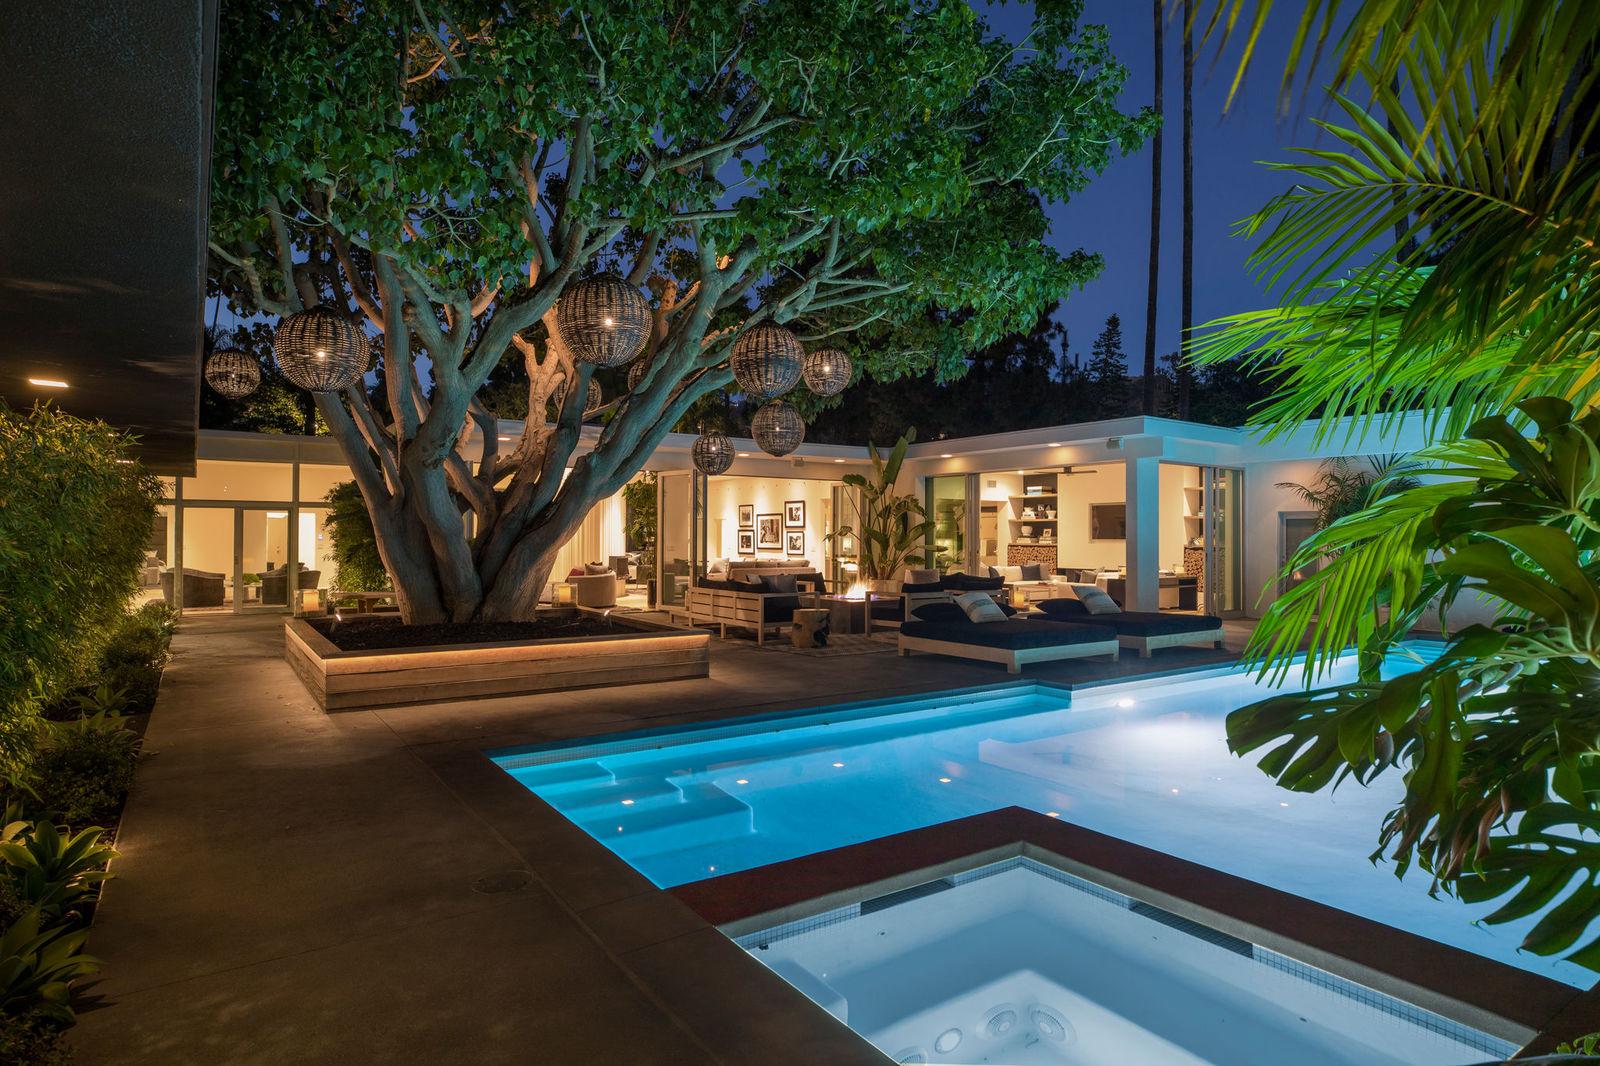 Vista del jardín de la casa de Cindy Crawford. /Foto: Oasisonlomavista